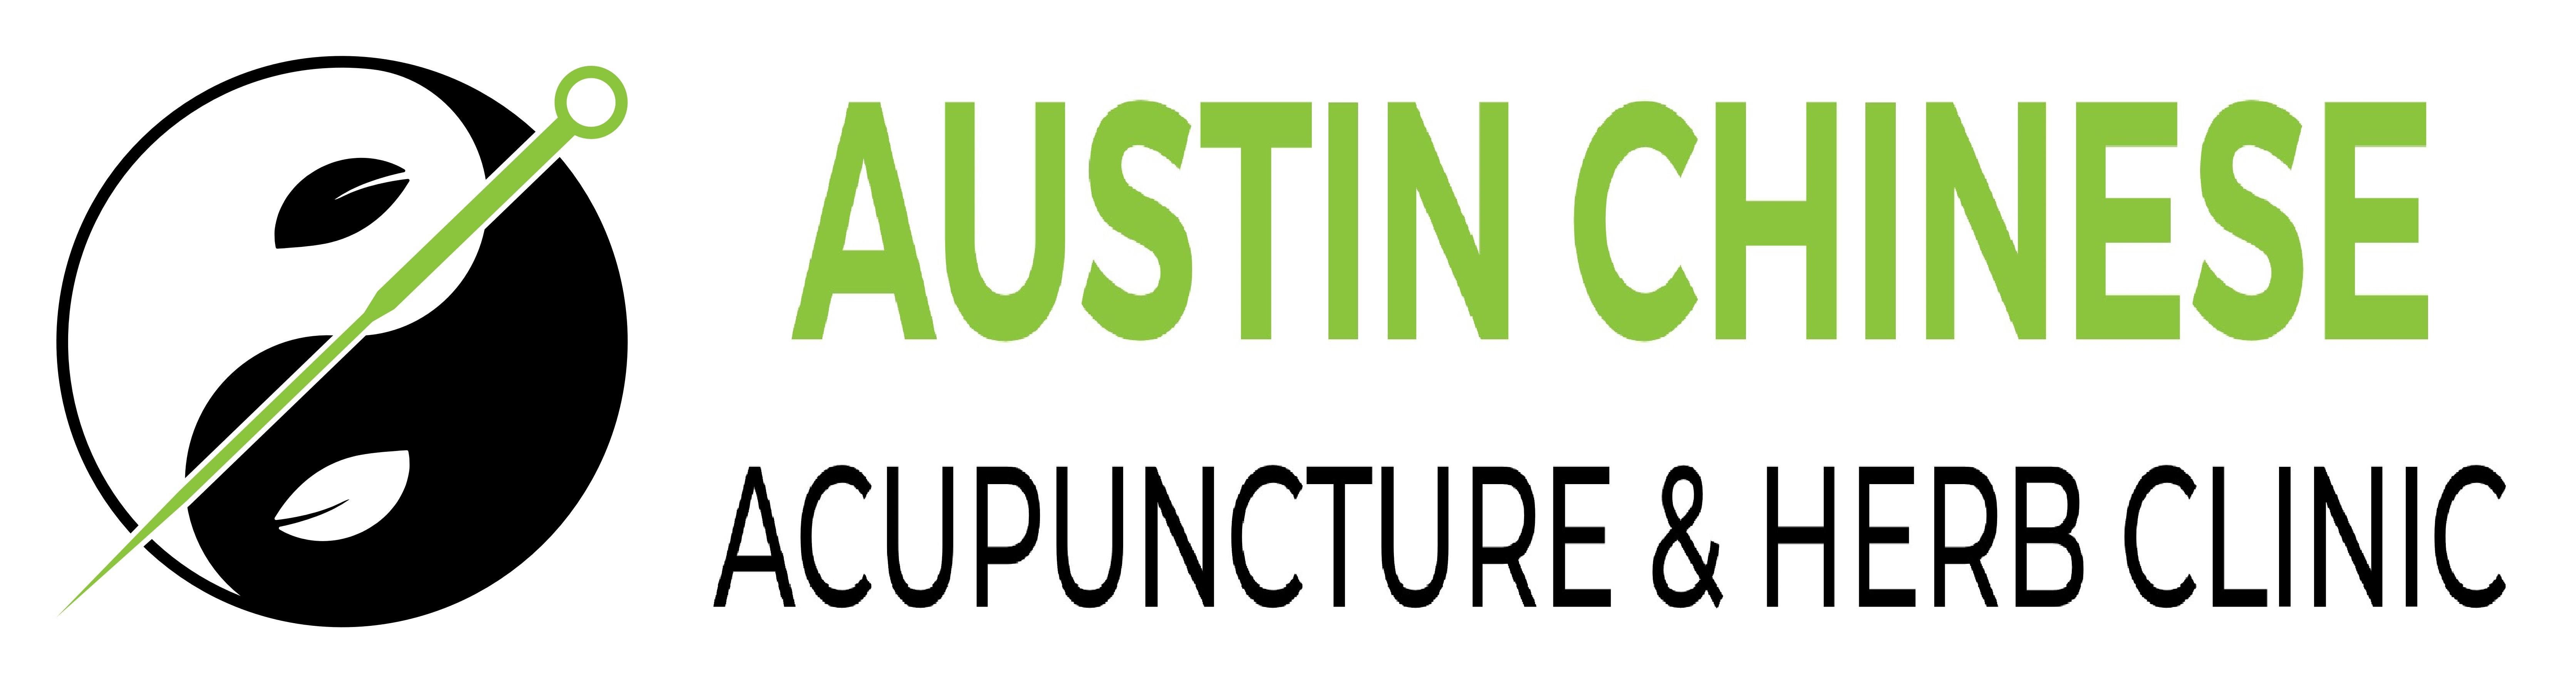 Austin Chinese Acupuncture & Herb Clinic:  Acupuncturist in Austin, TX